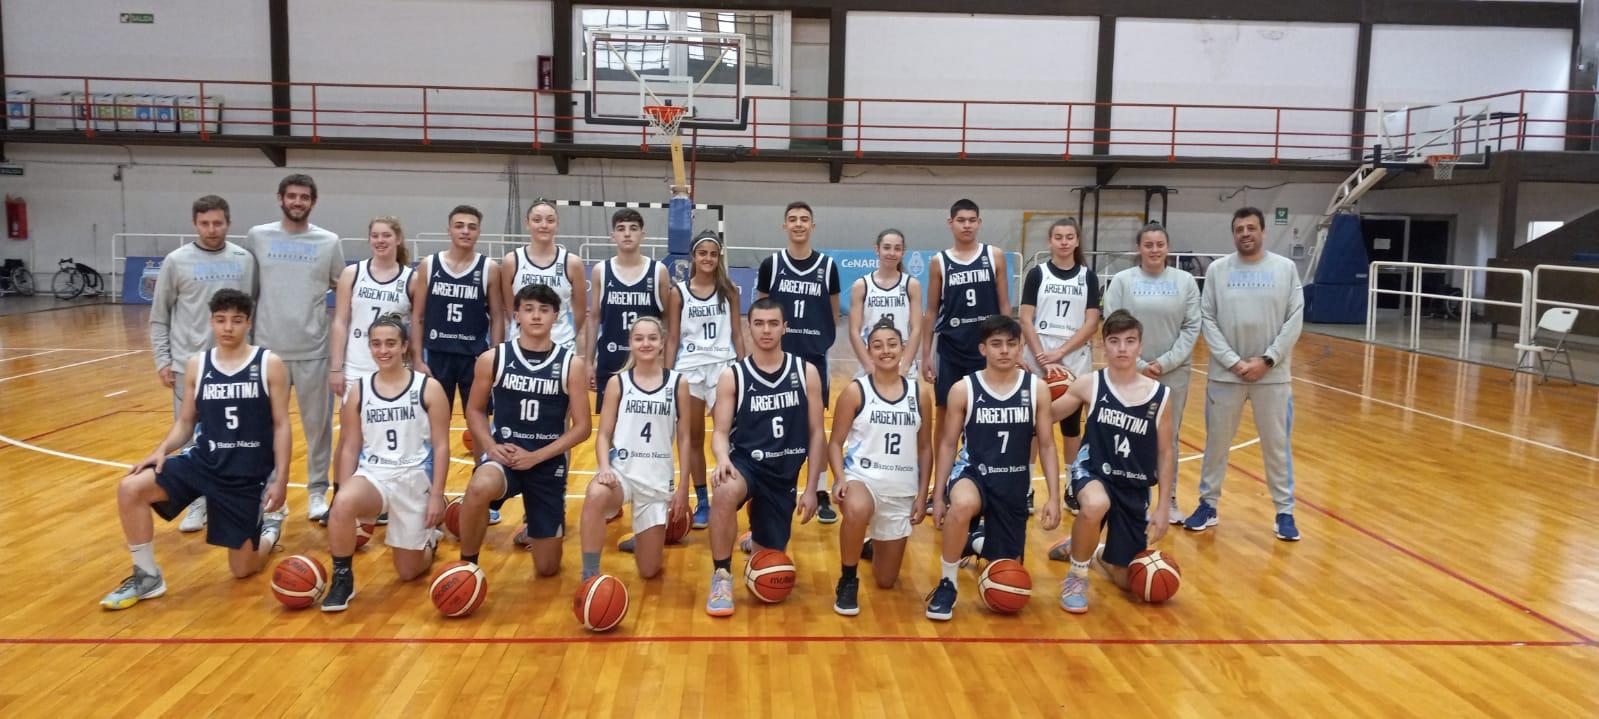 FIBA U15 Skills Challenge: el equipo masculino avanzó a octavos de final